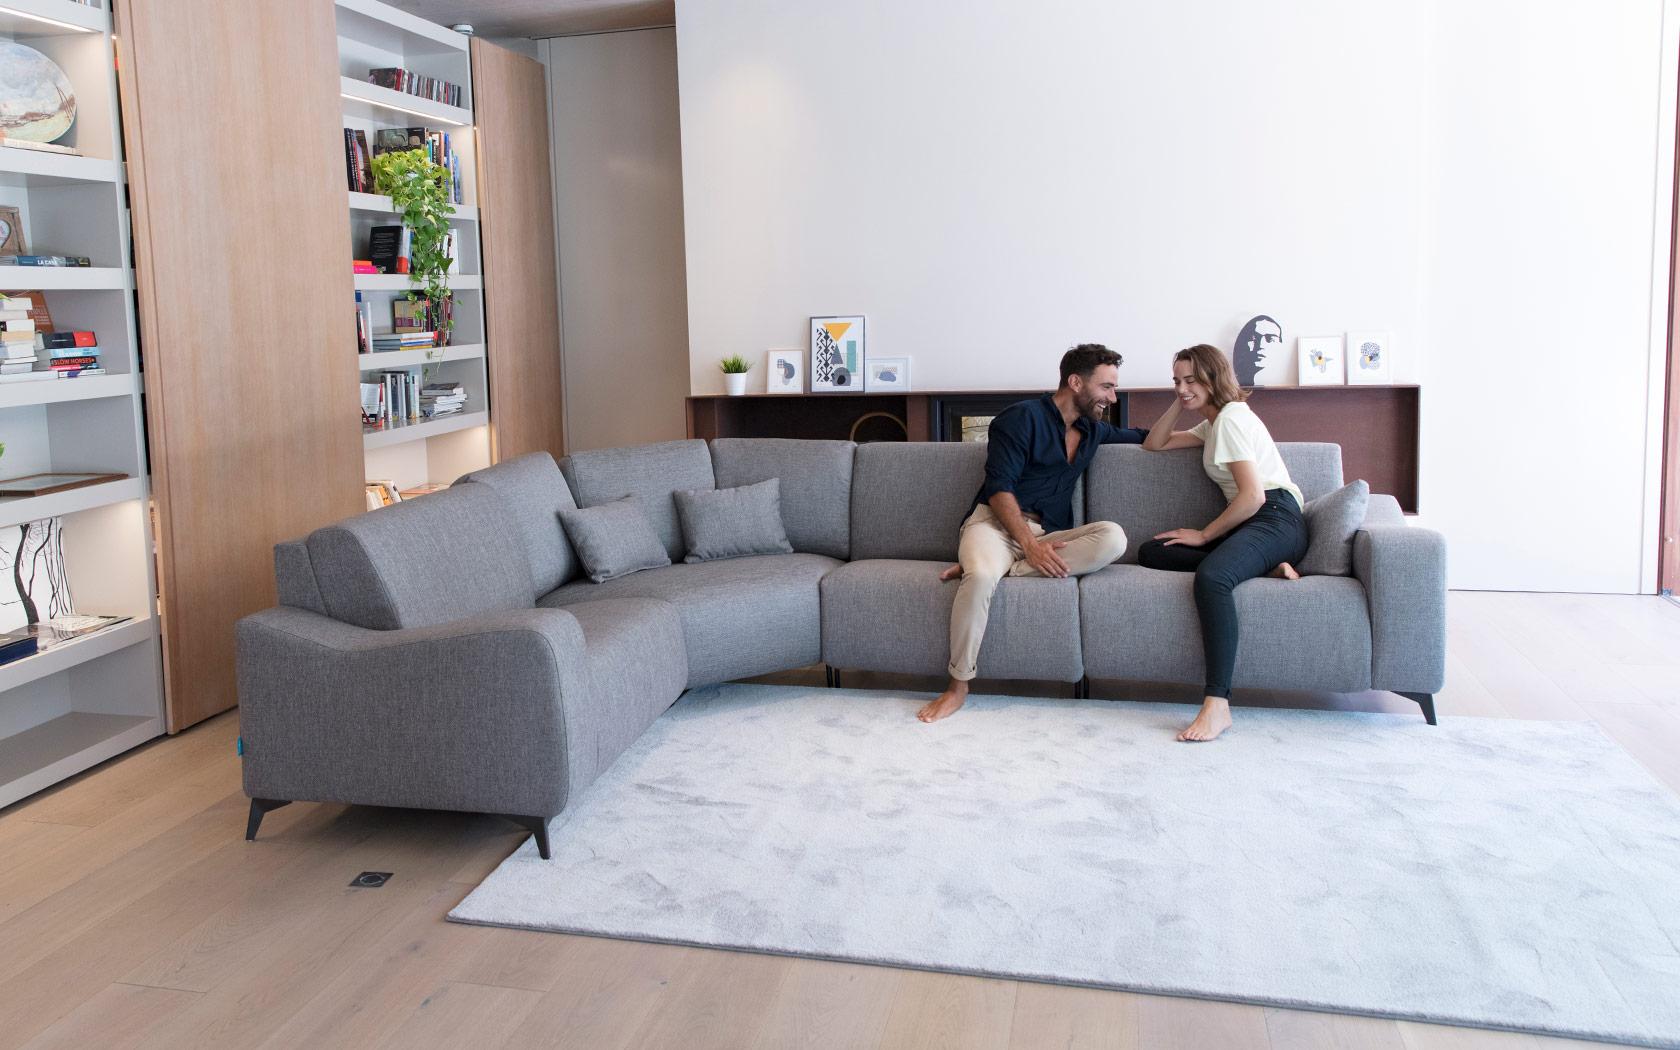 Atlanta sofa relax 2020 13